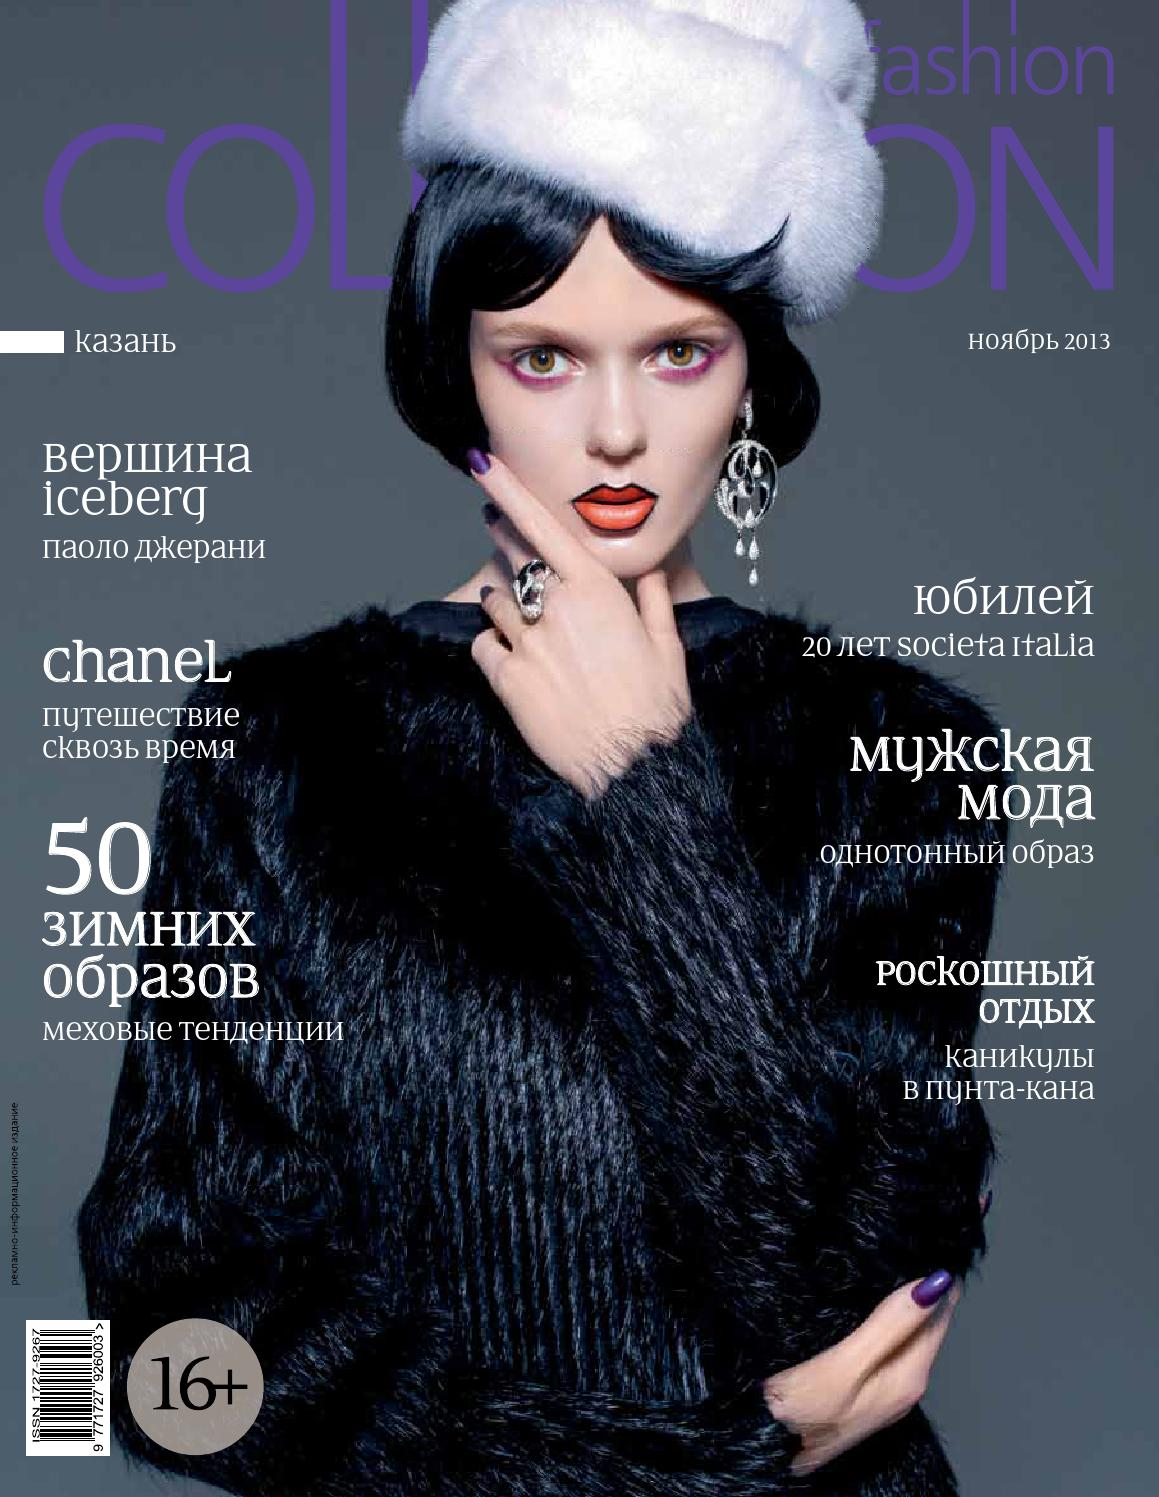 Feet Adelina Sharipova nude photos 2019